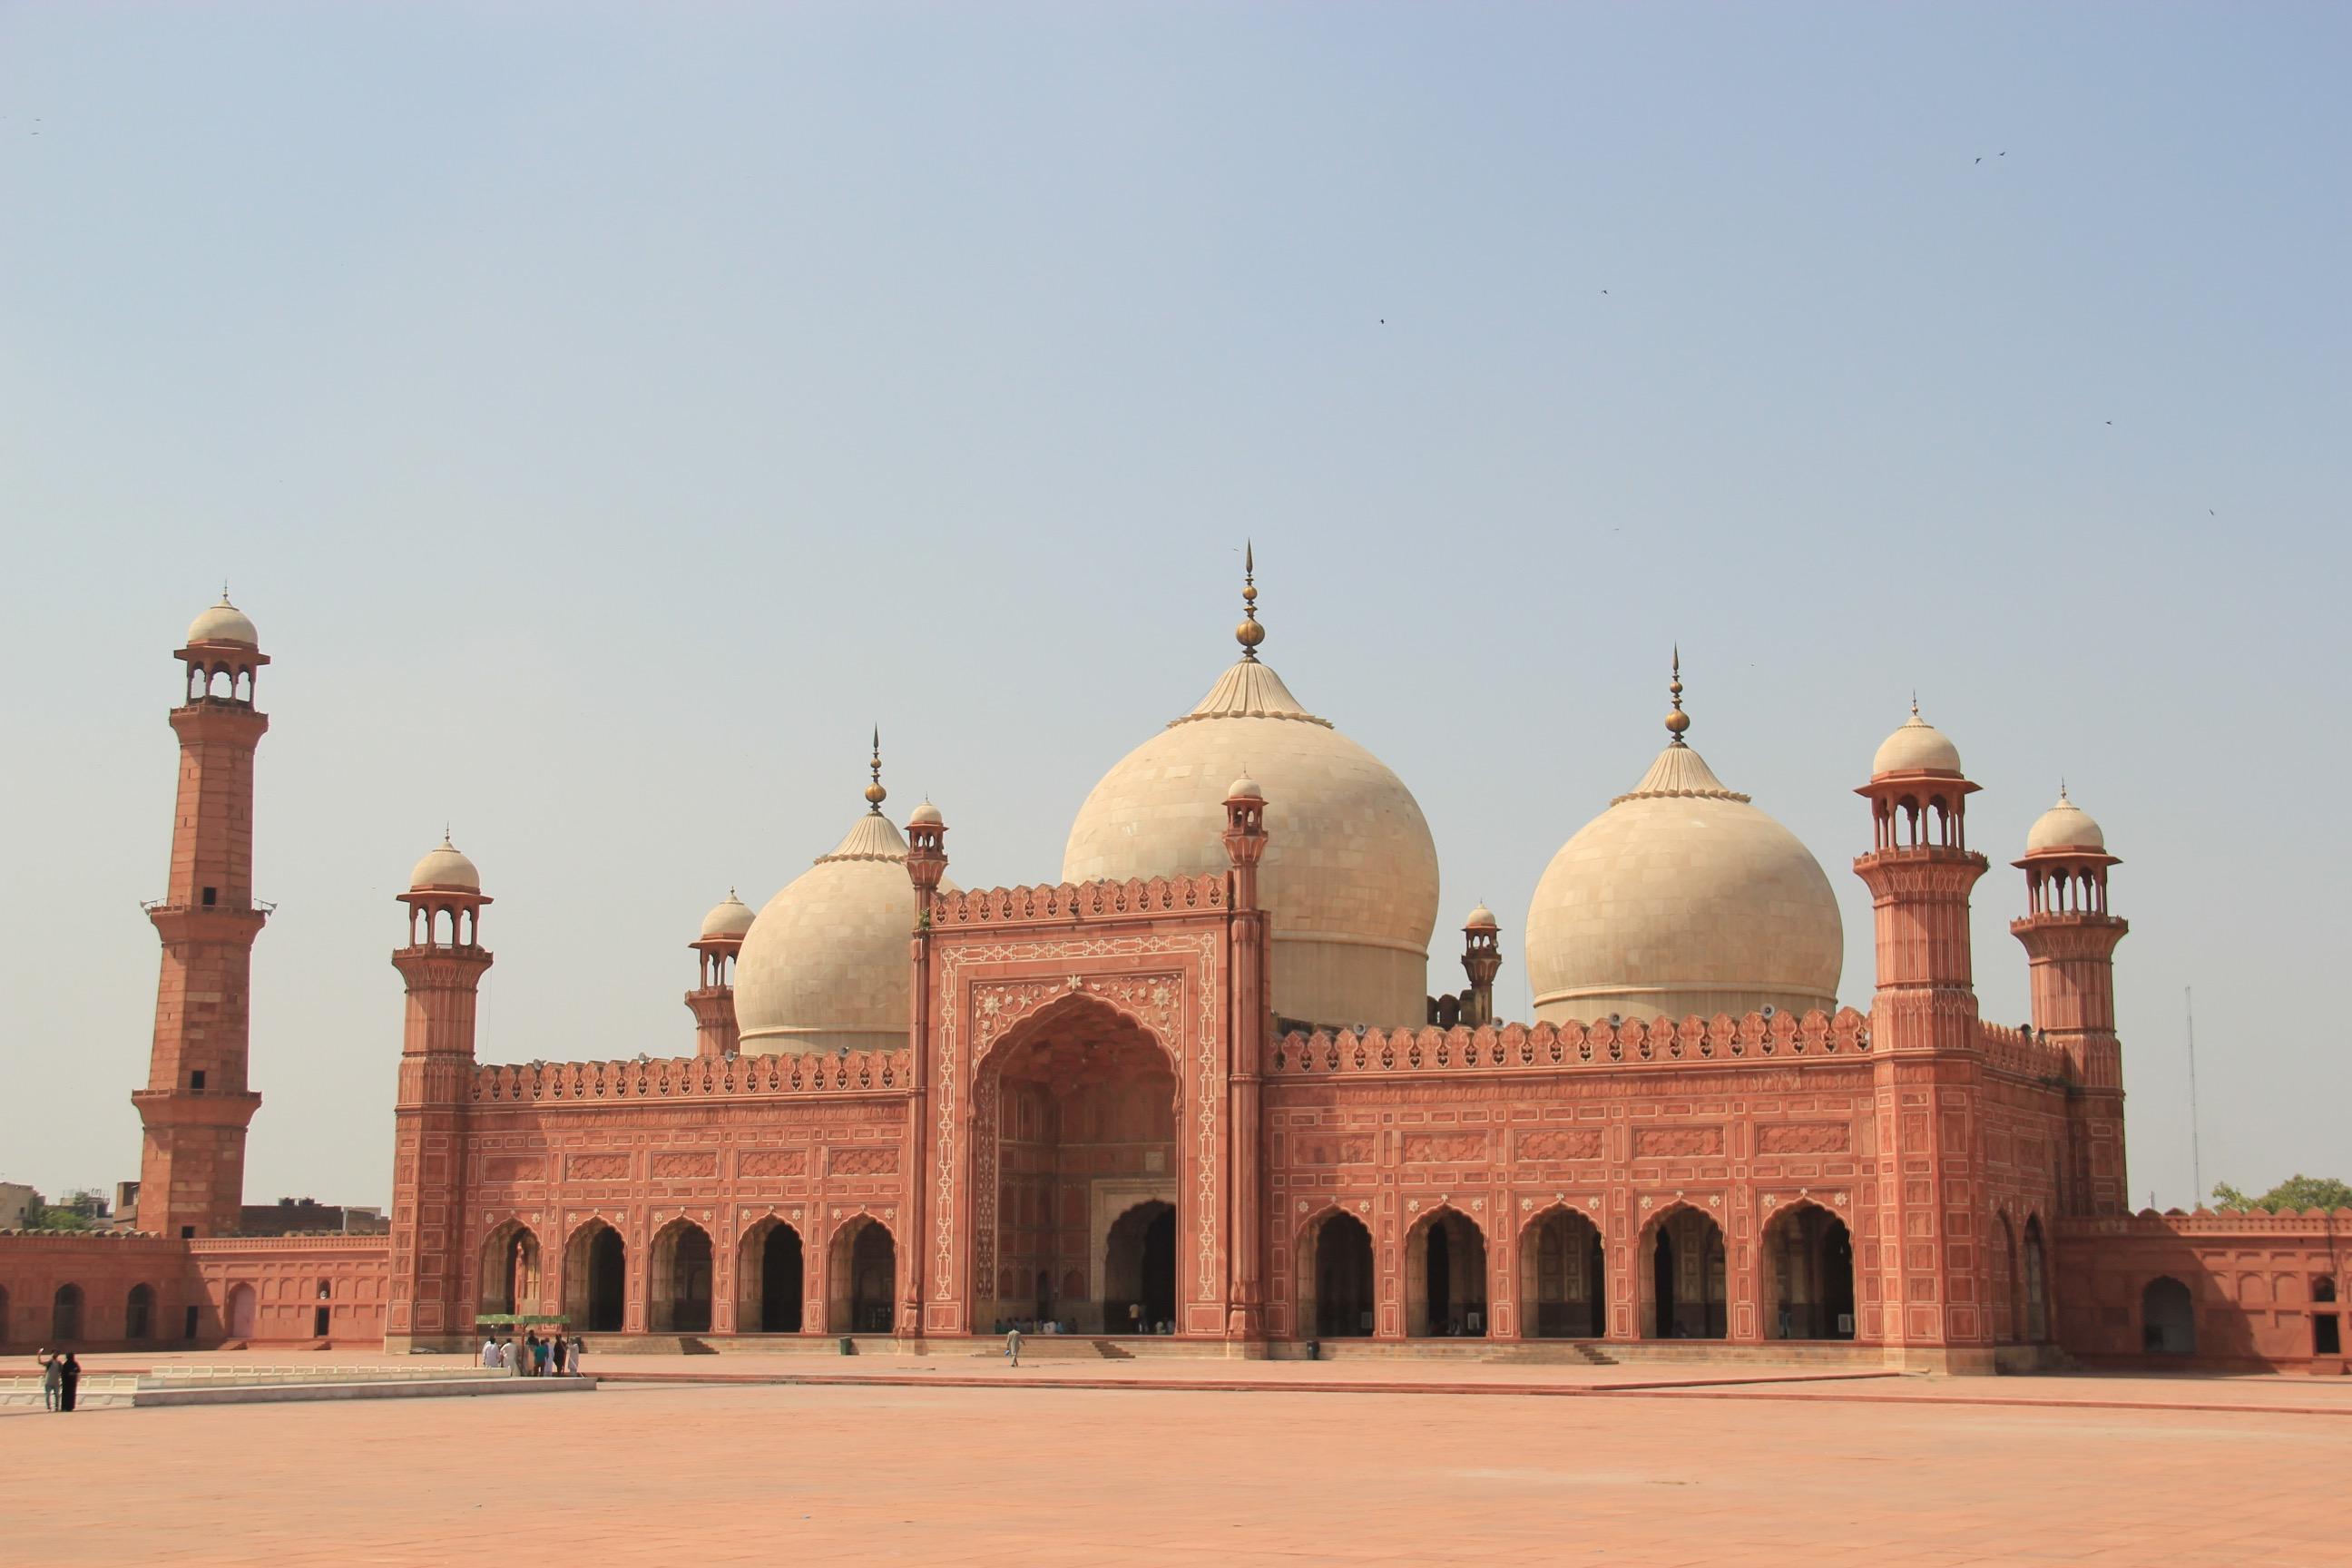 Badshahi Mosque - Wikipedia